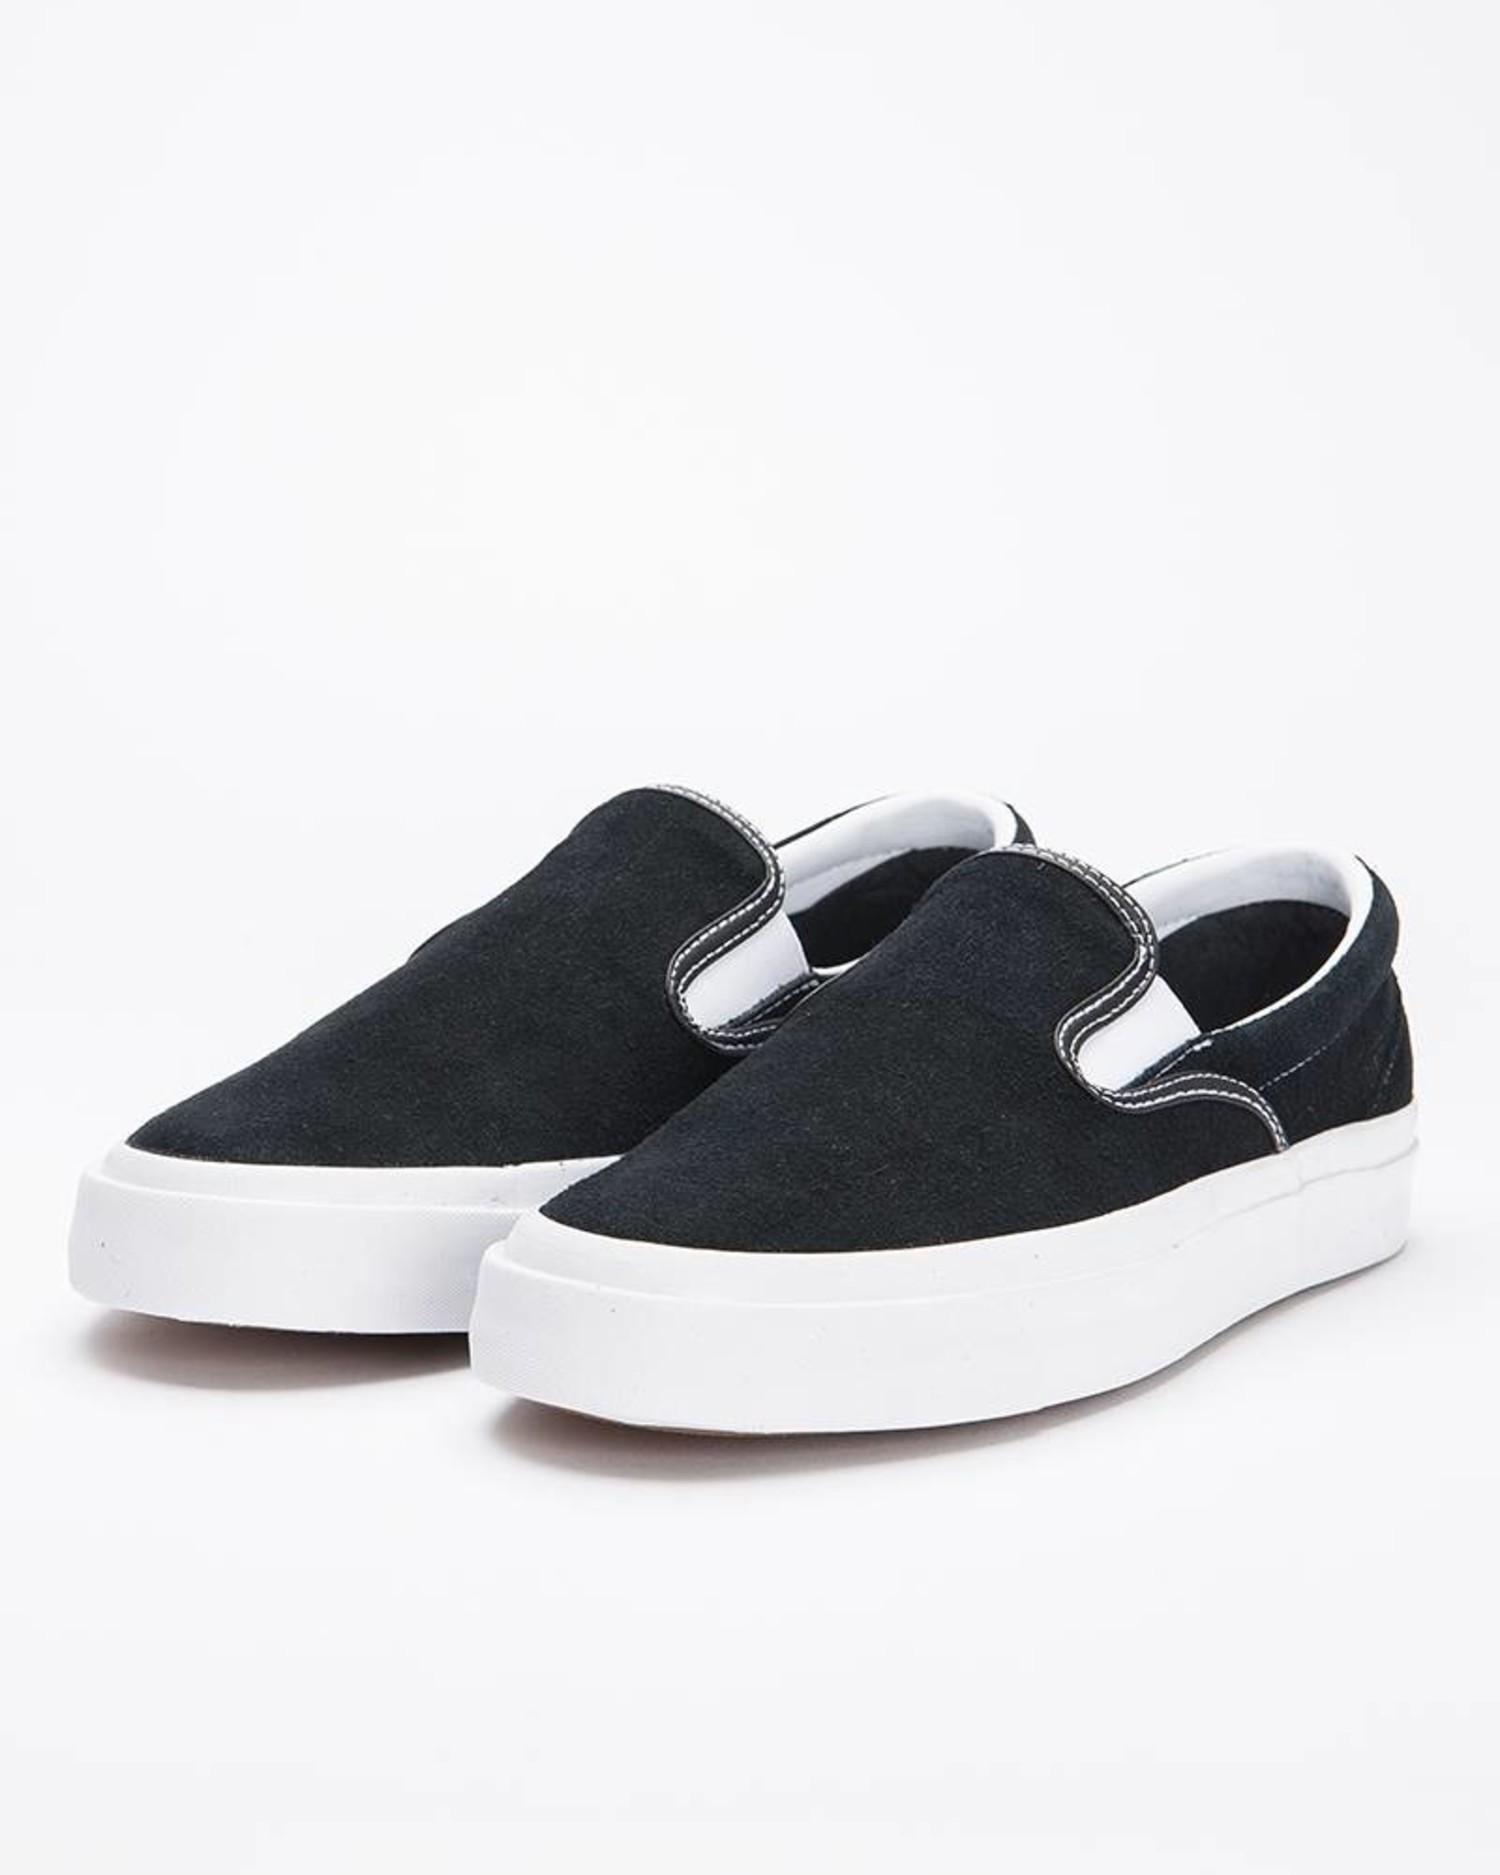 Converse One Star CC Slip Black/White